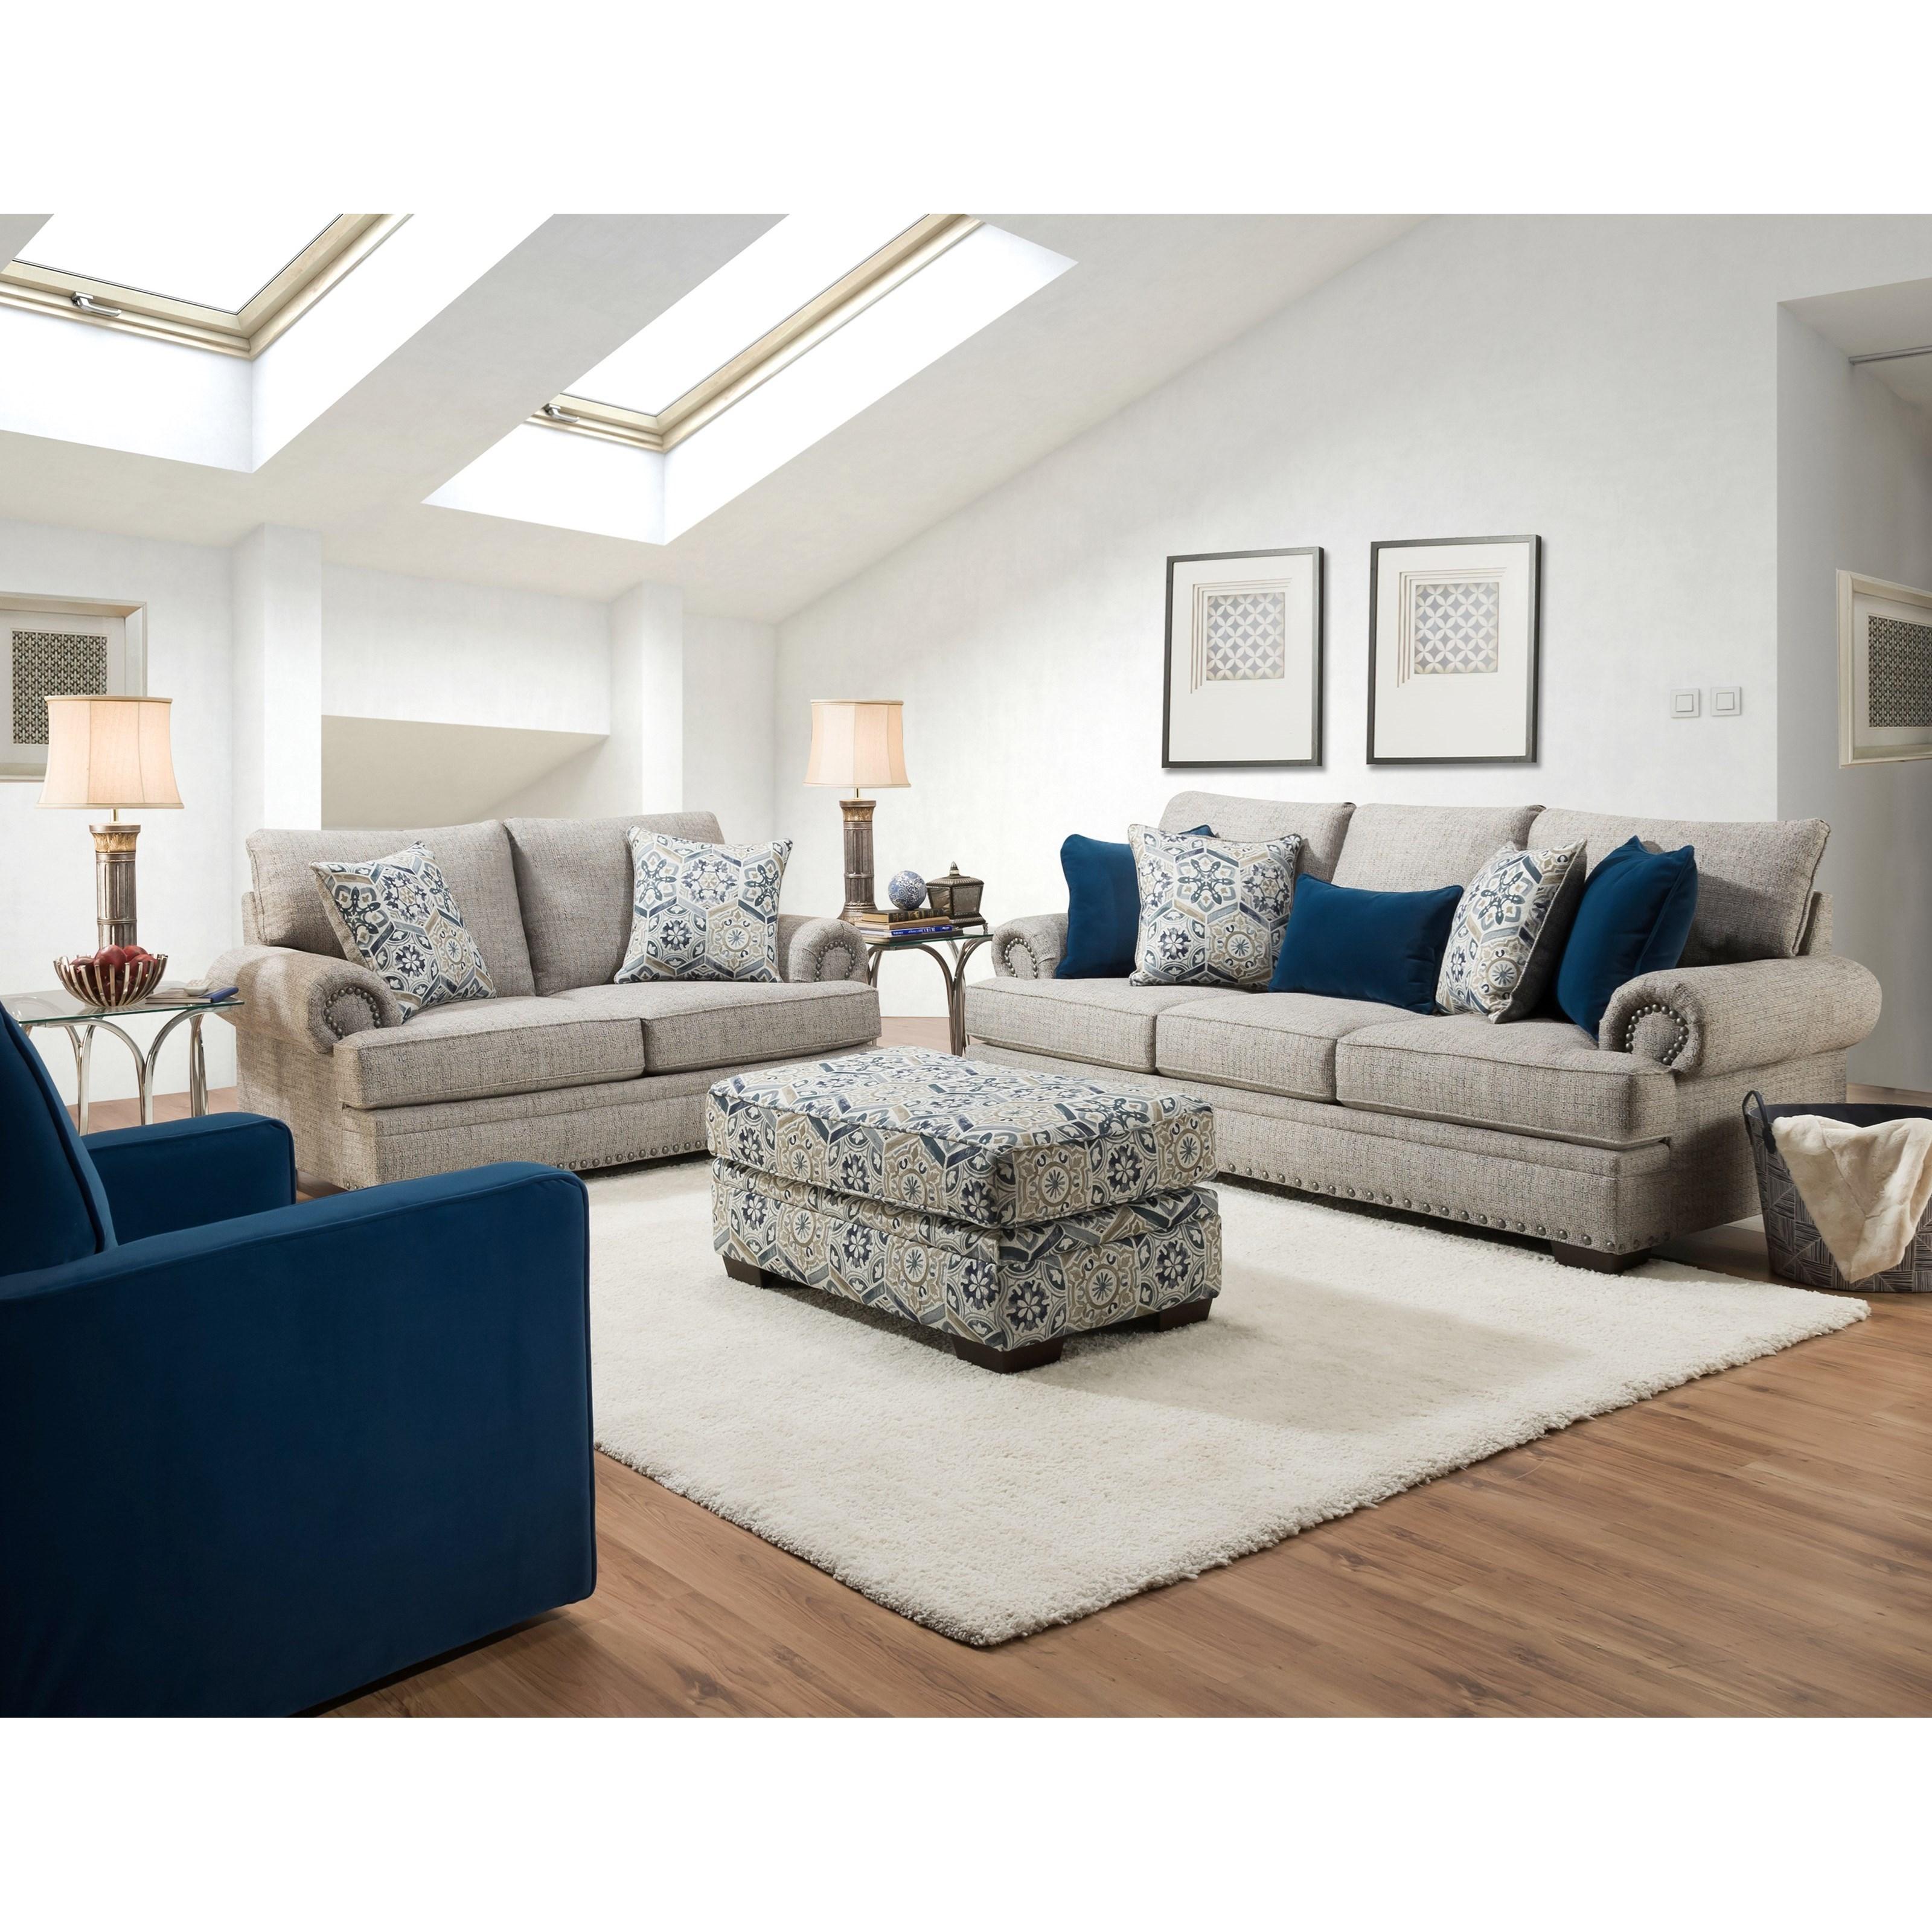 8100 Living Room Group by Peak Living at Darvin Furniture